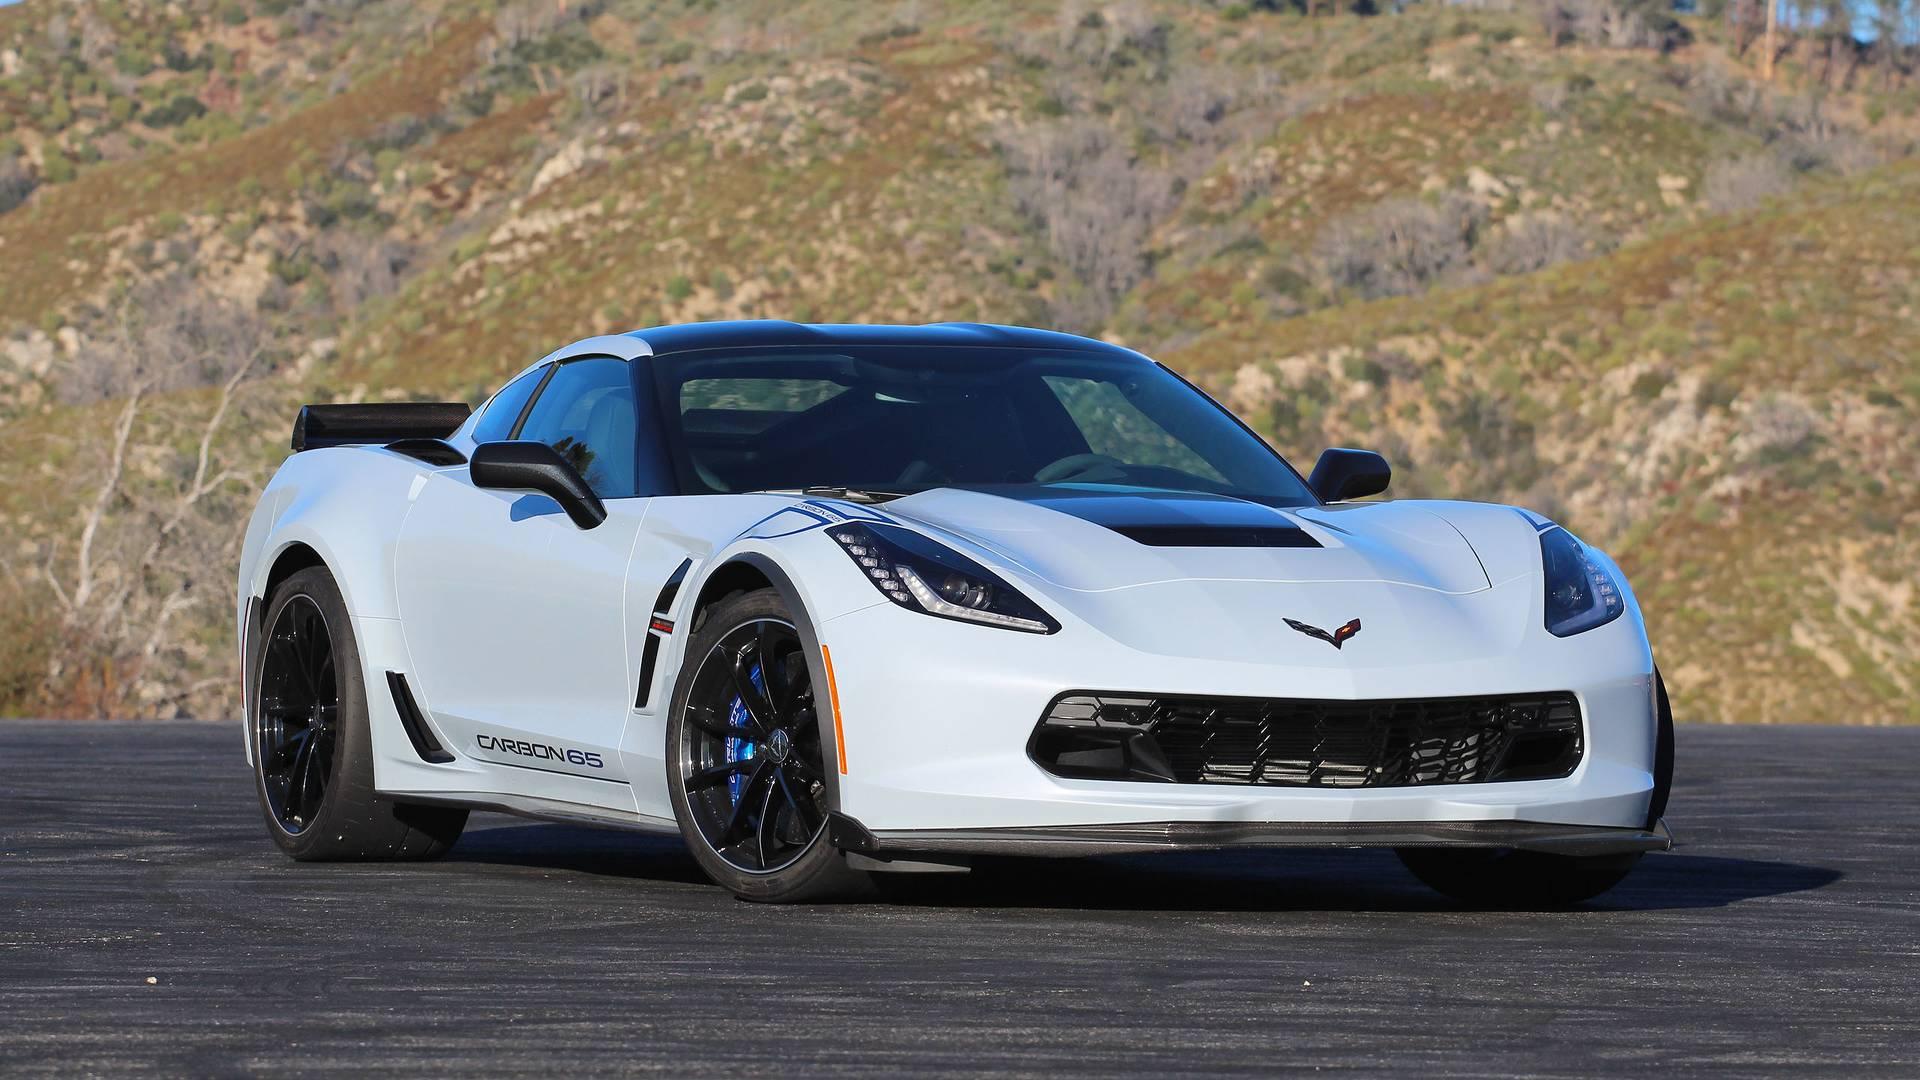 Pictures Of Corvettes >> 2018my Chevy Corvette Production Lowest Since 1959